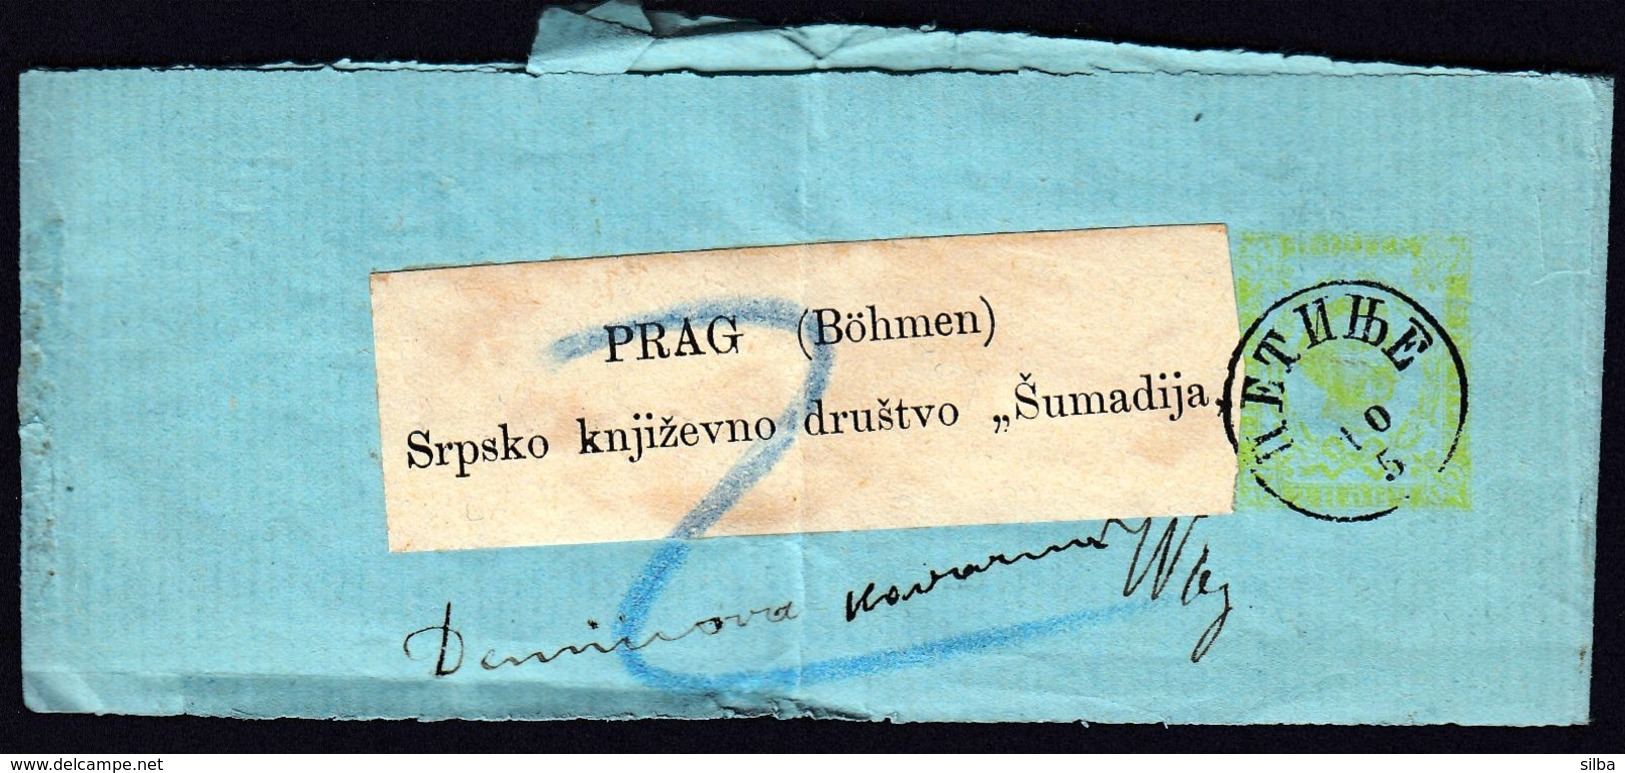 Montenegro Cetinje 1895 / Newspaper Wrapper / Sent To Bohmen Srpsko Knjizevno Drustvo Sumadija - Montenegro